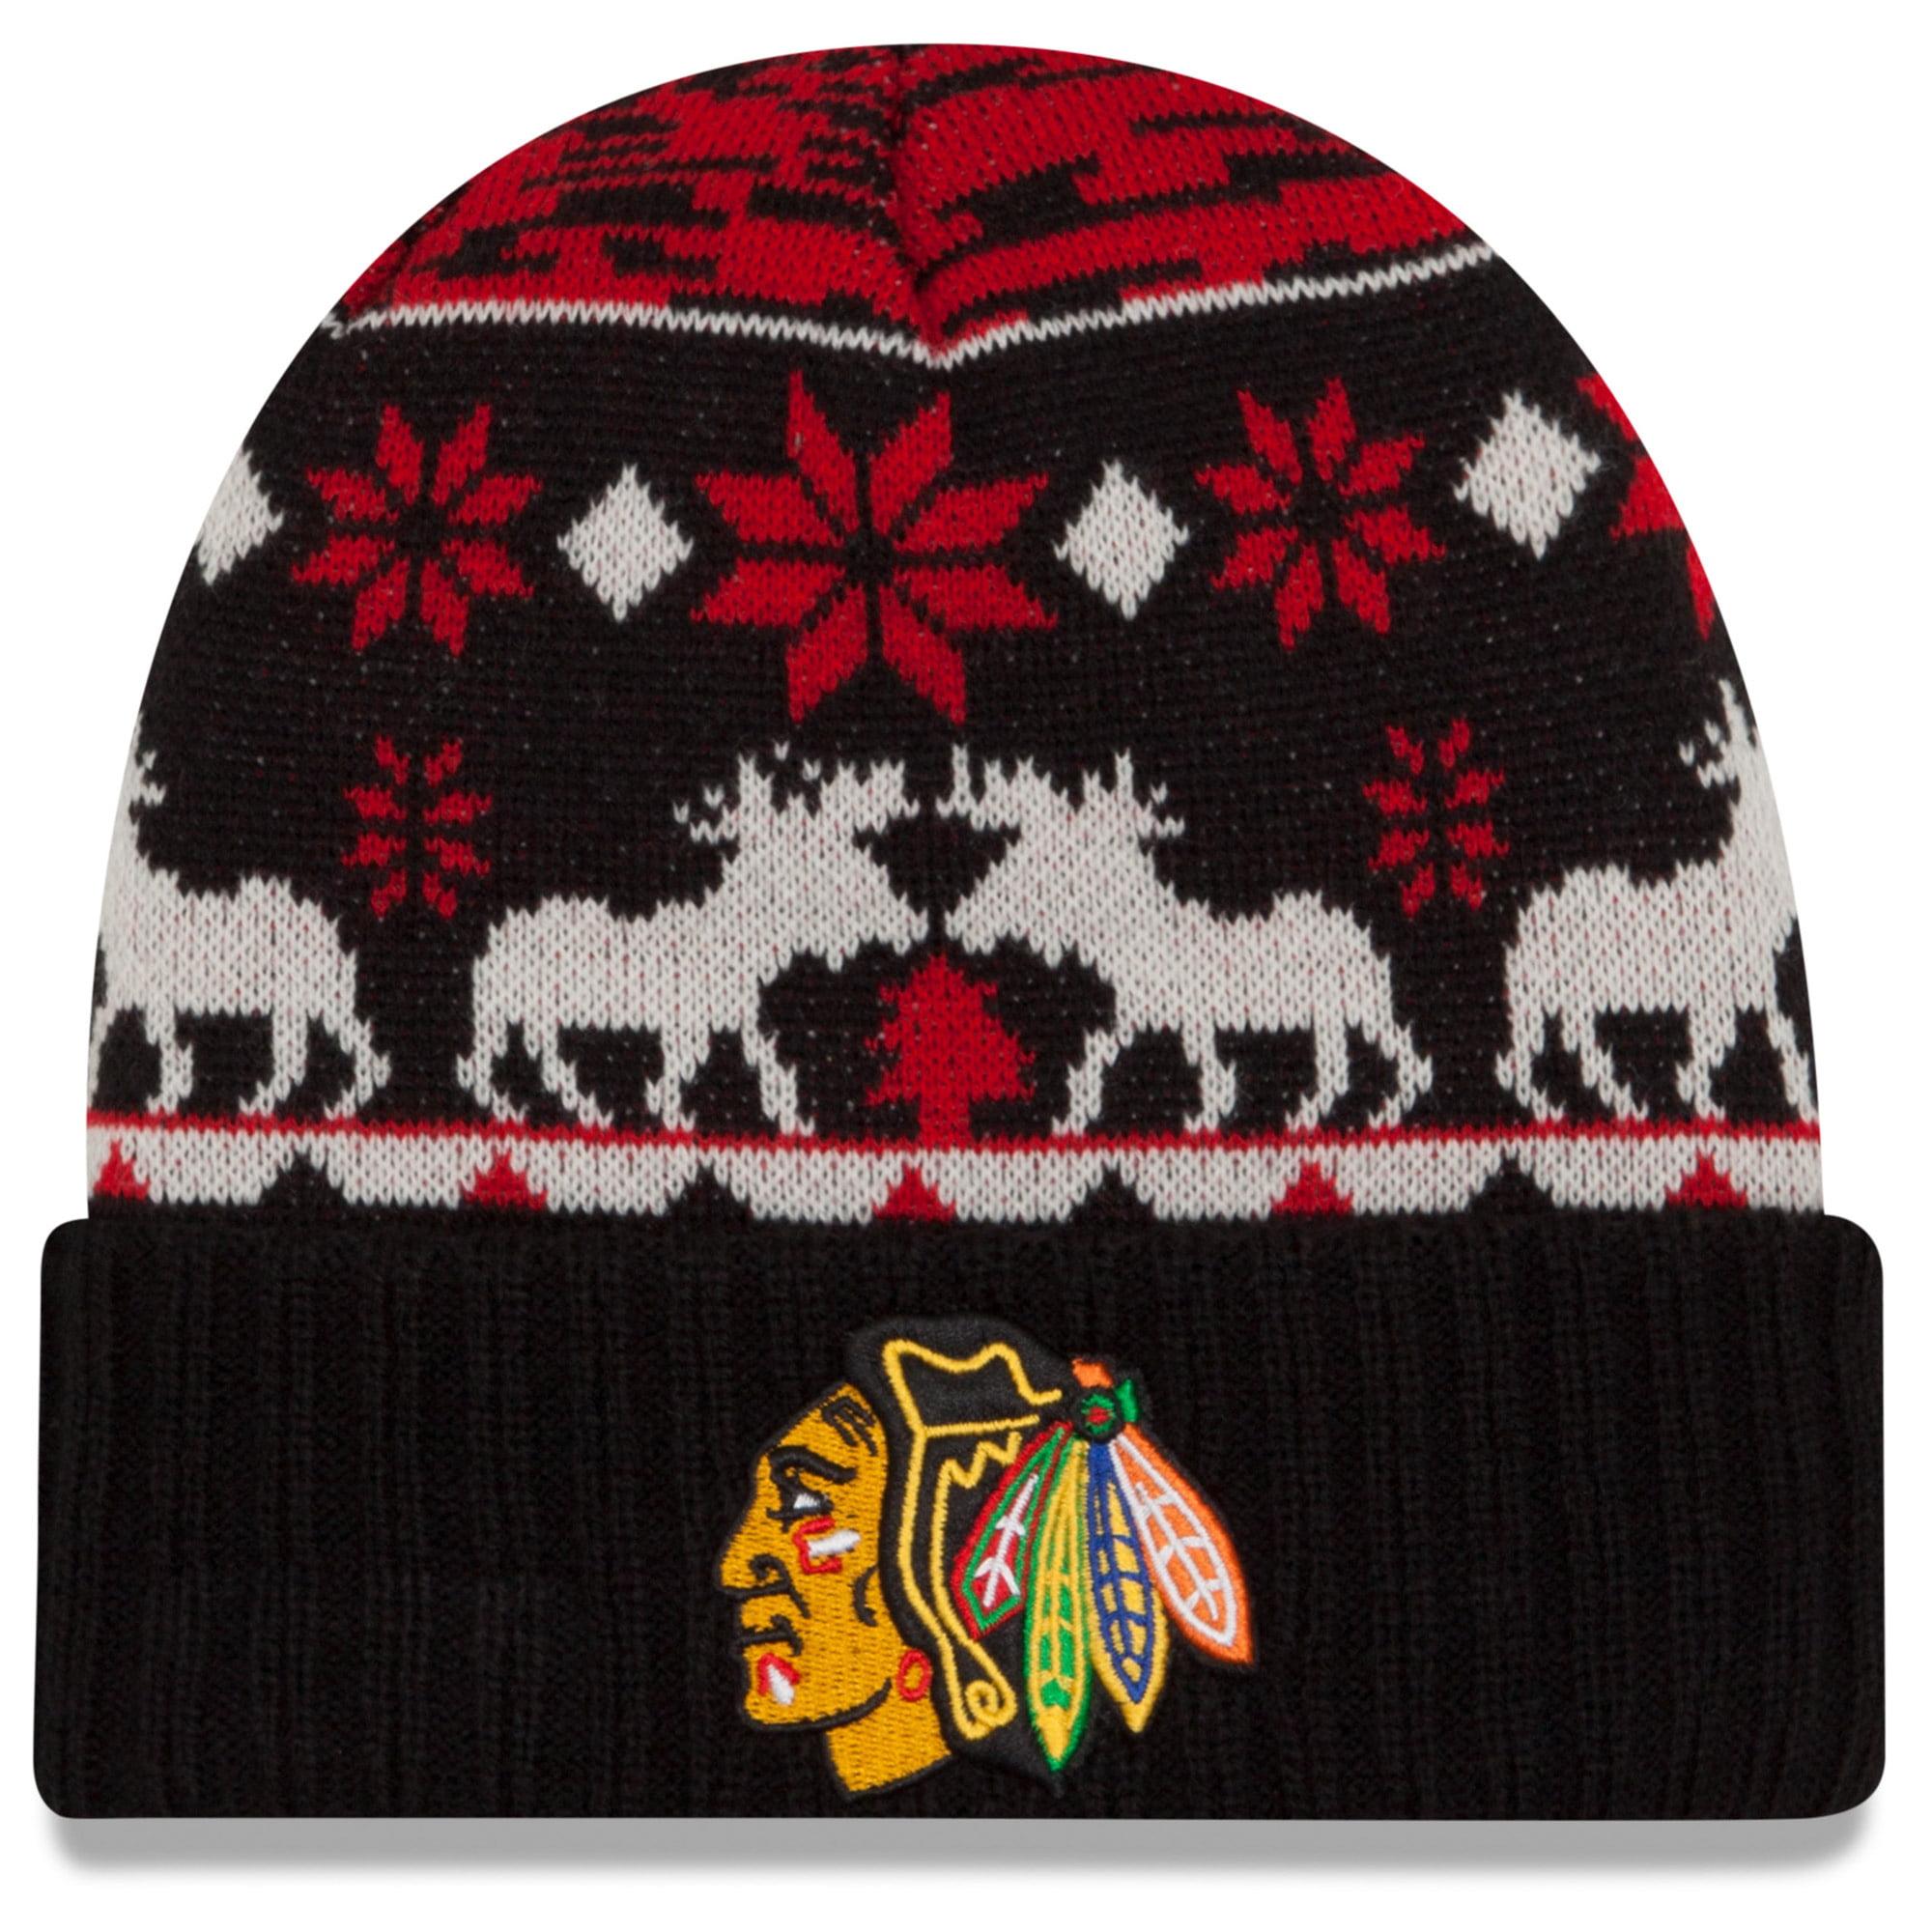 Chicago Blackhawks New Era Team Mooser Cuffed Knit Hat - Red - OSFA